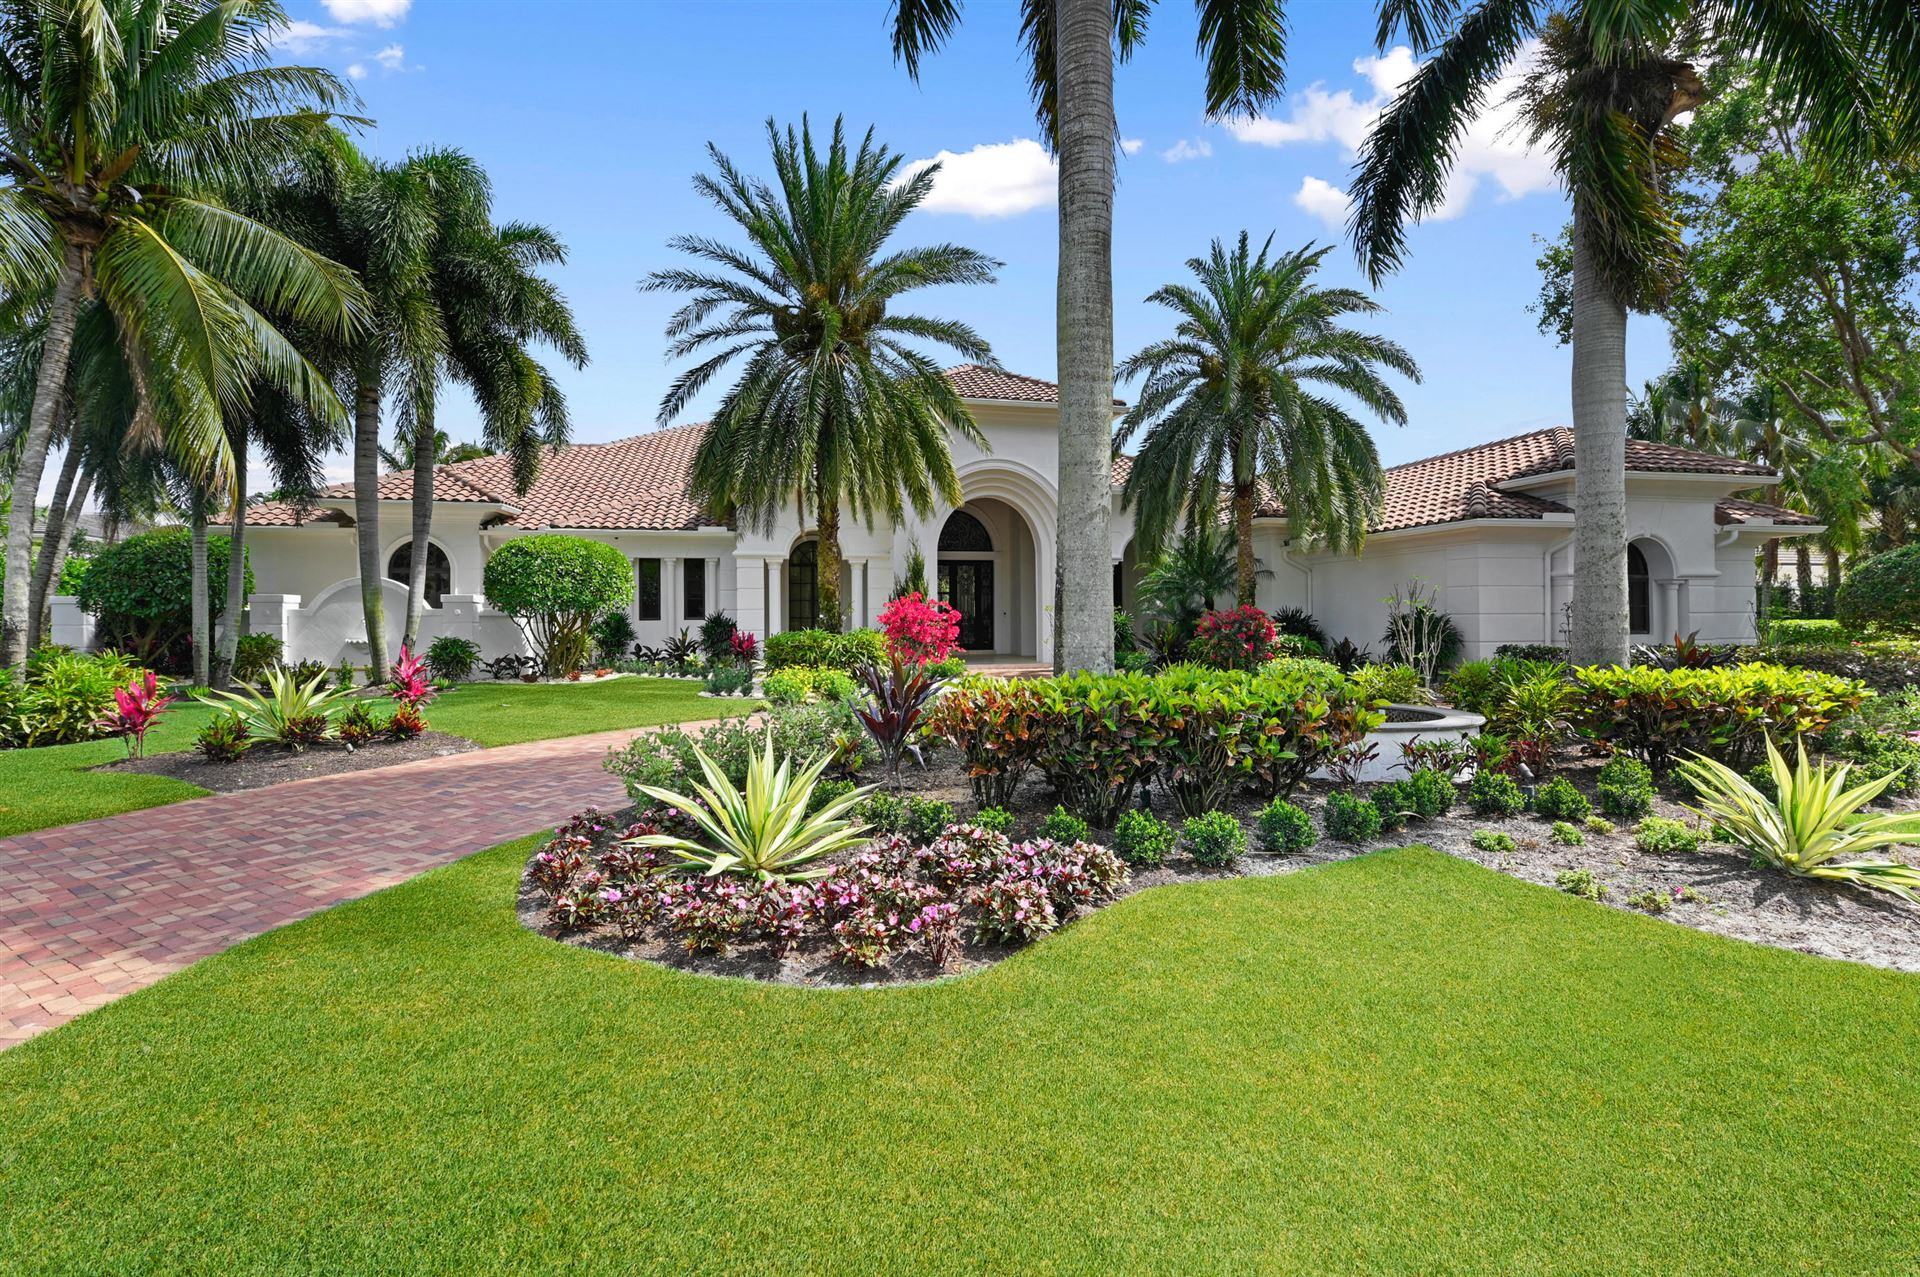 Photo of 12210 Tillinghast Circle, Palm Beach Gardens, FL 33418 (MLS # RX-10712897)